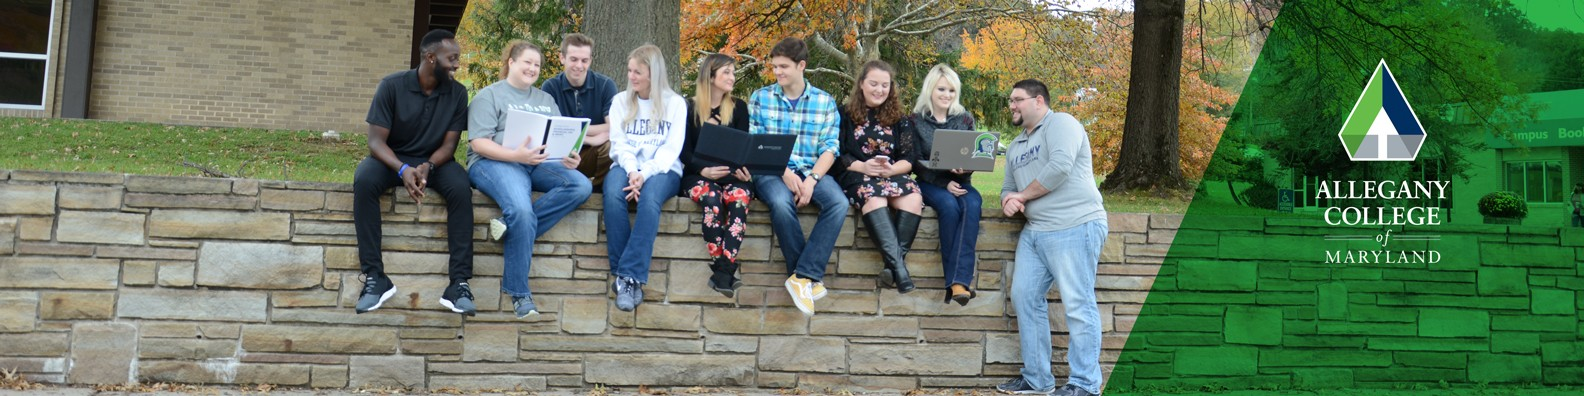 Allegany College of Maryland | LinkedIn